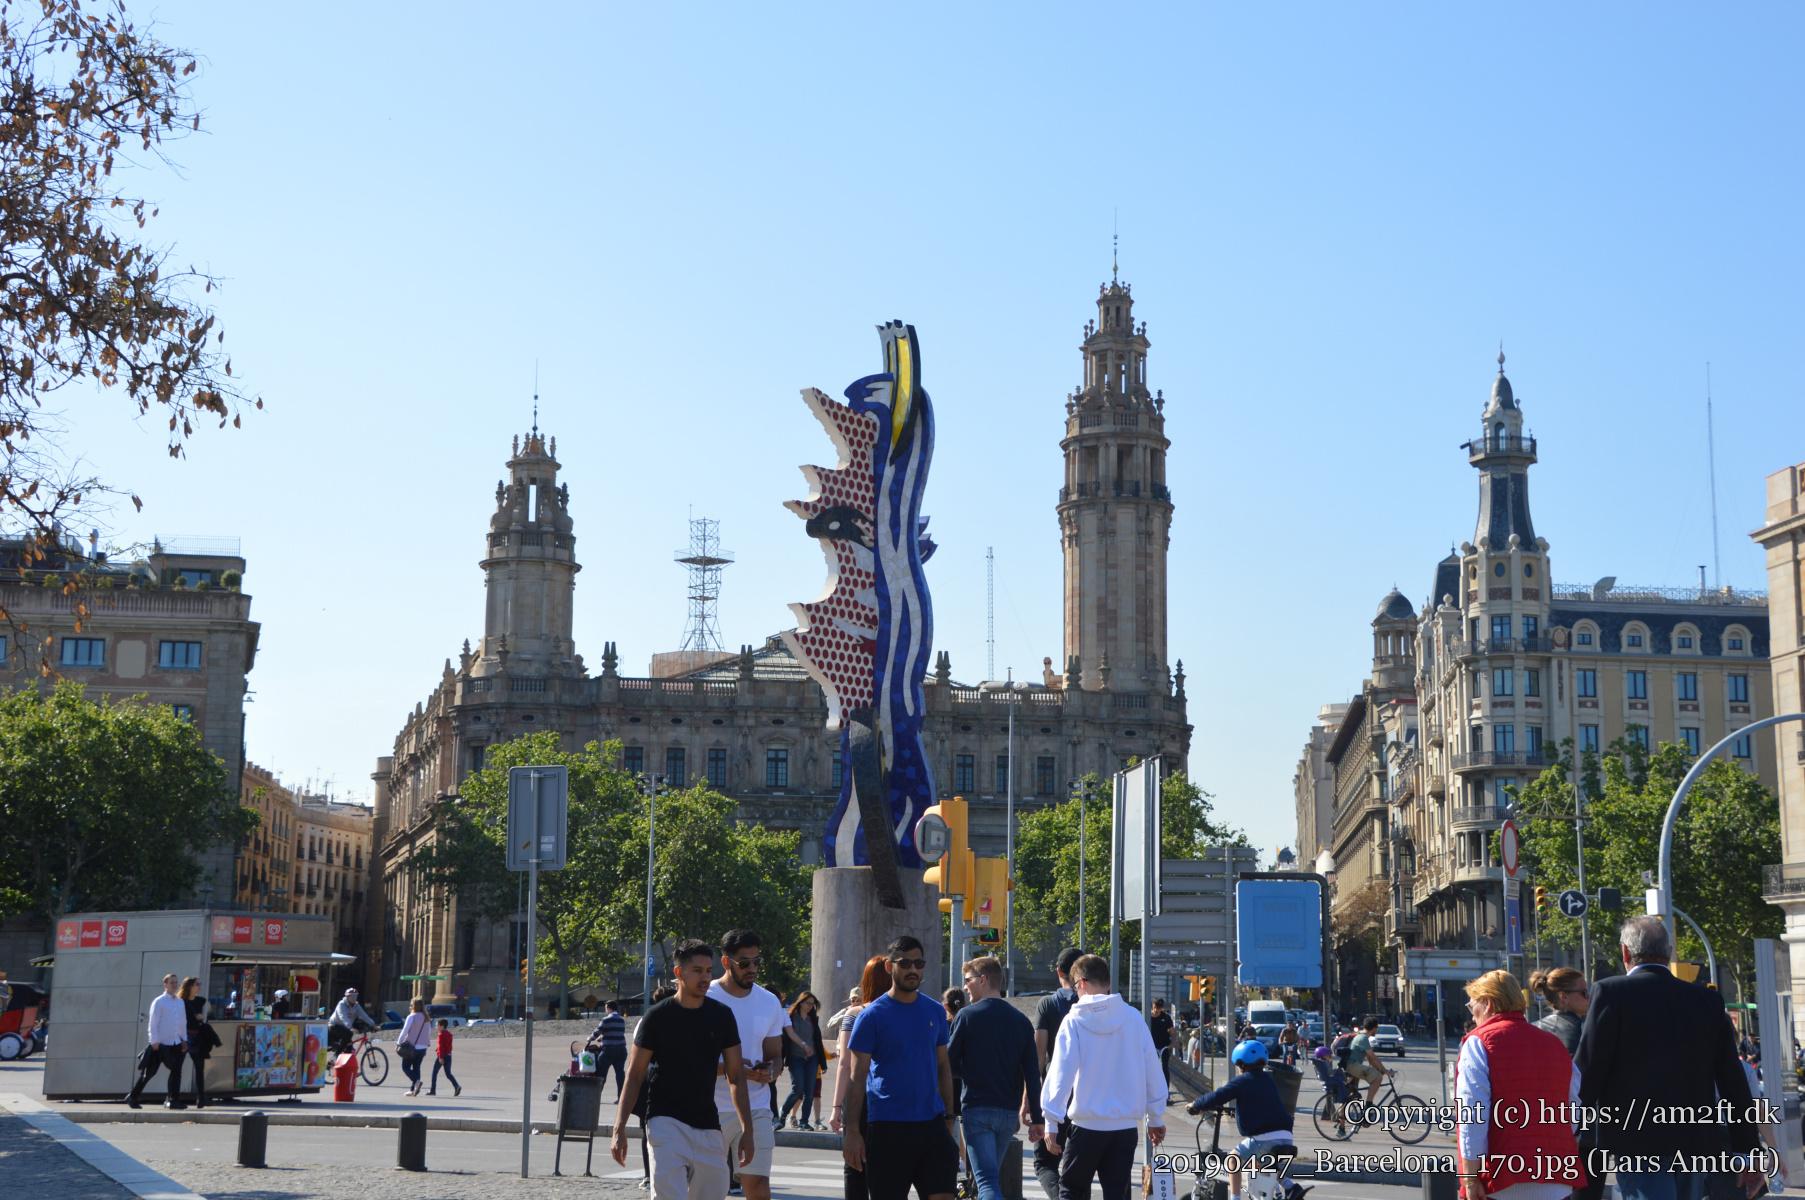 20190427_Barcelona_170.JPG